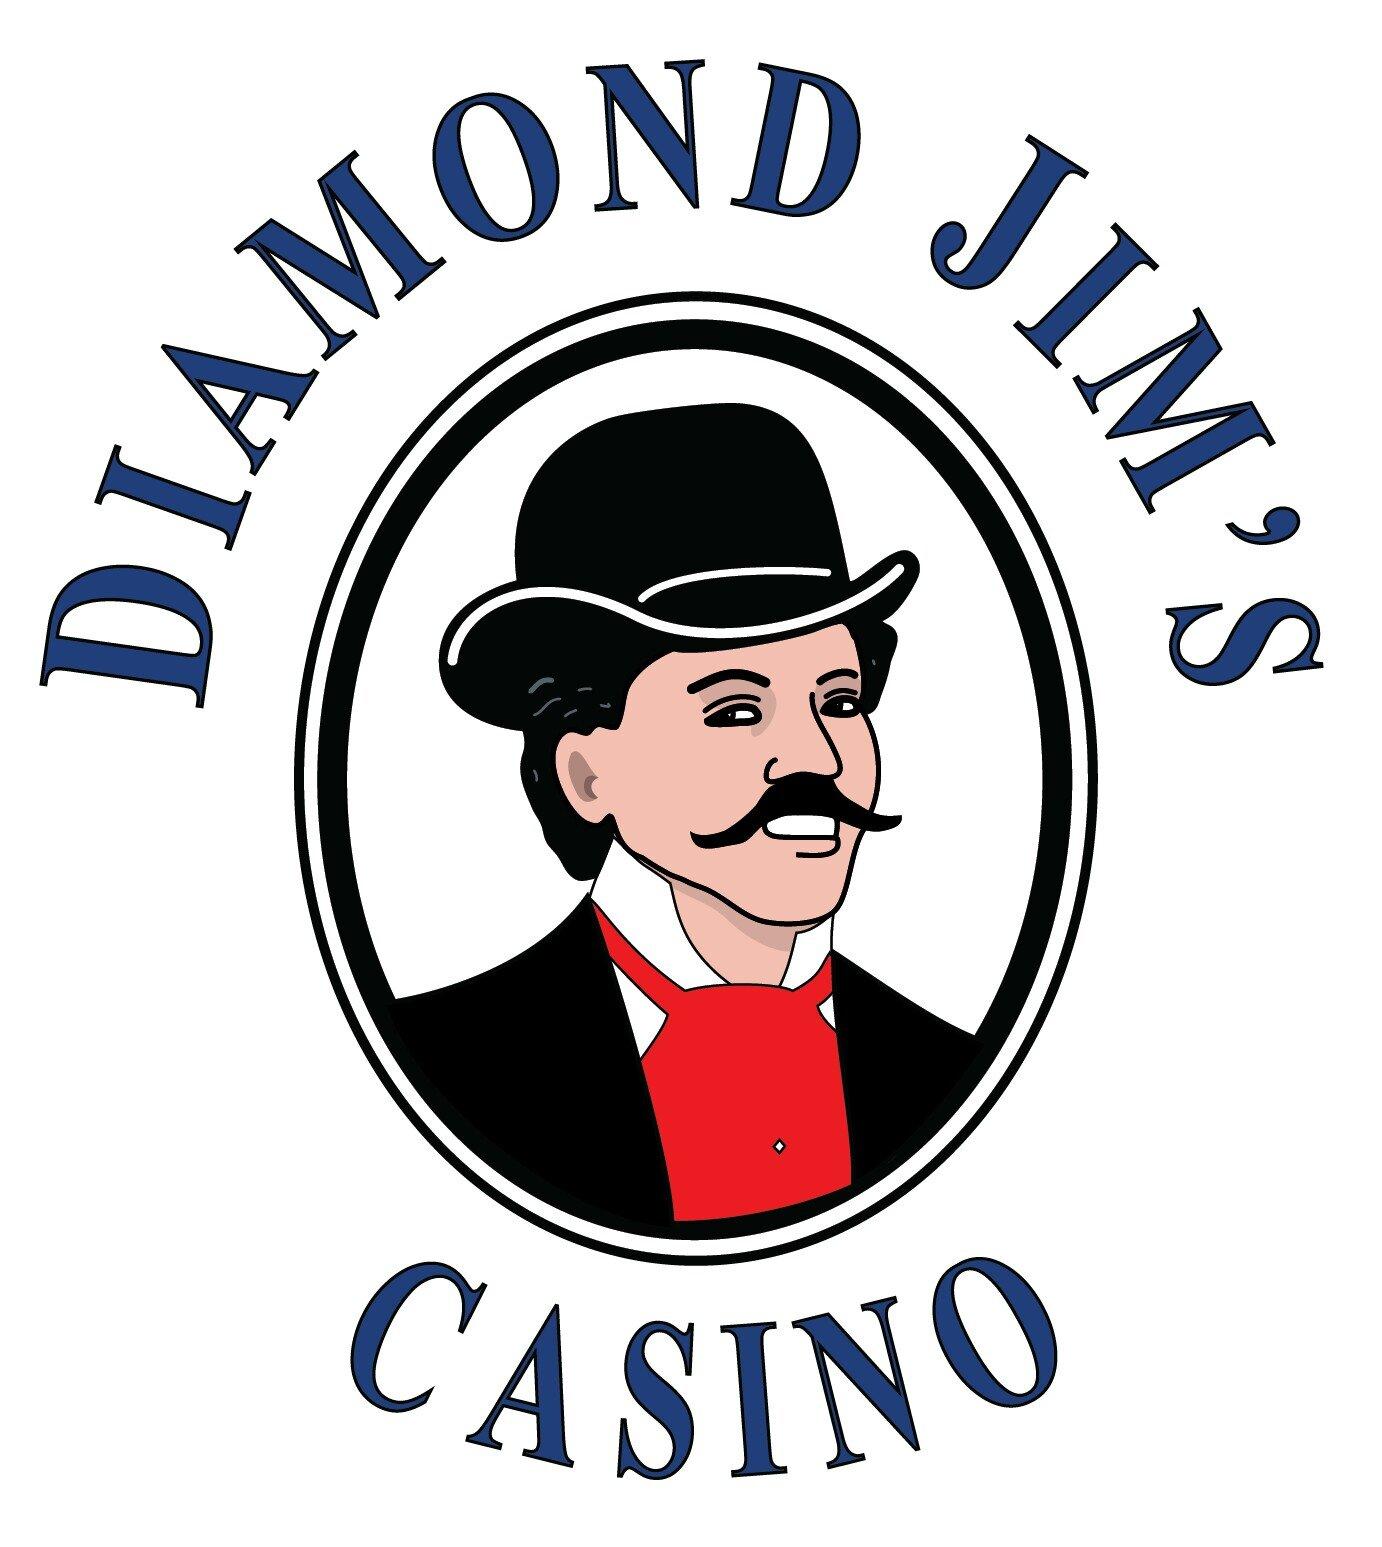 Jims casino connecticut foxwood casino